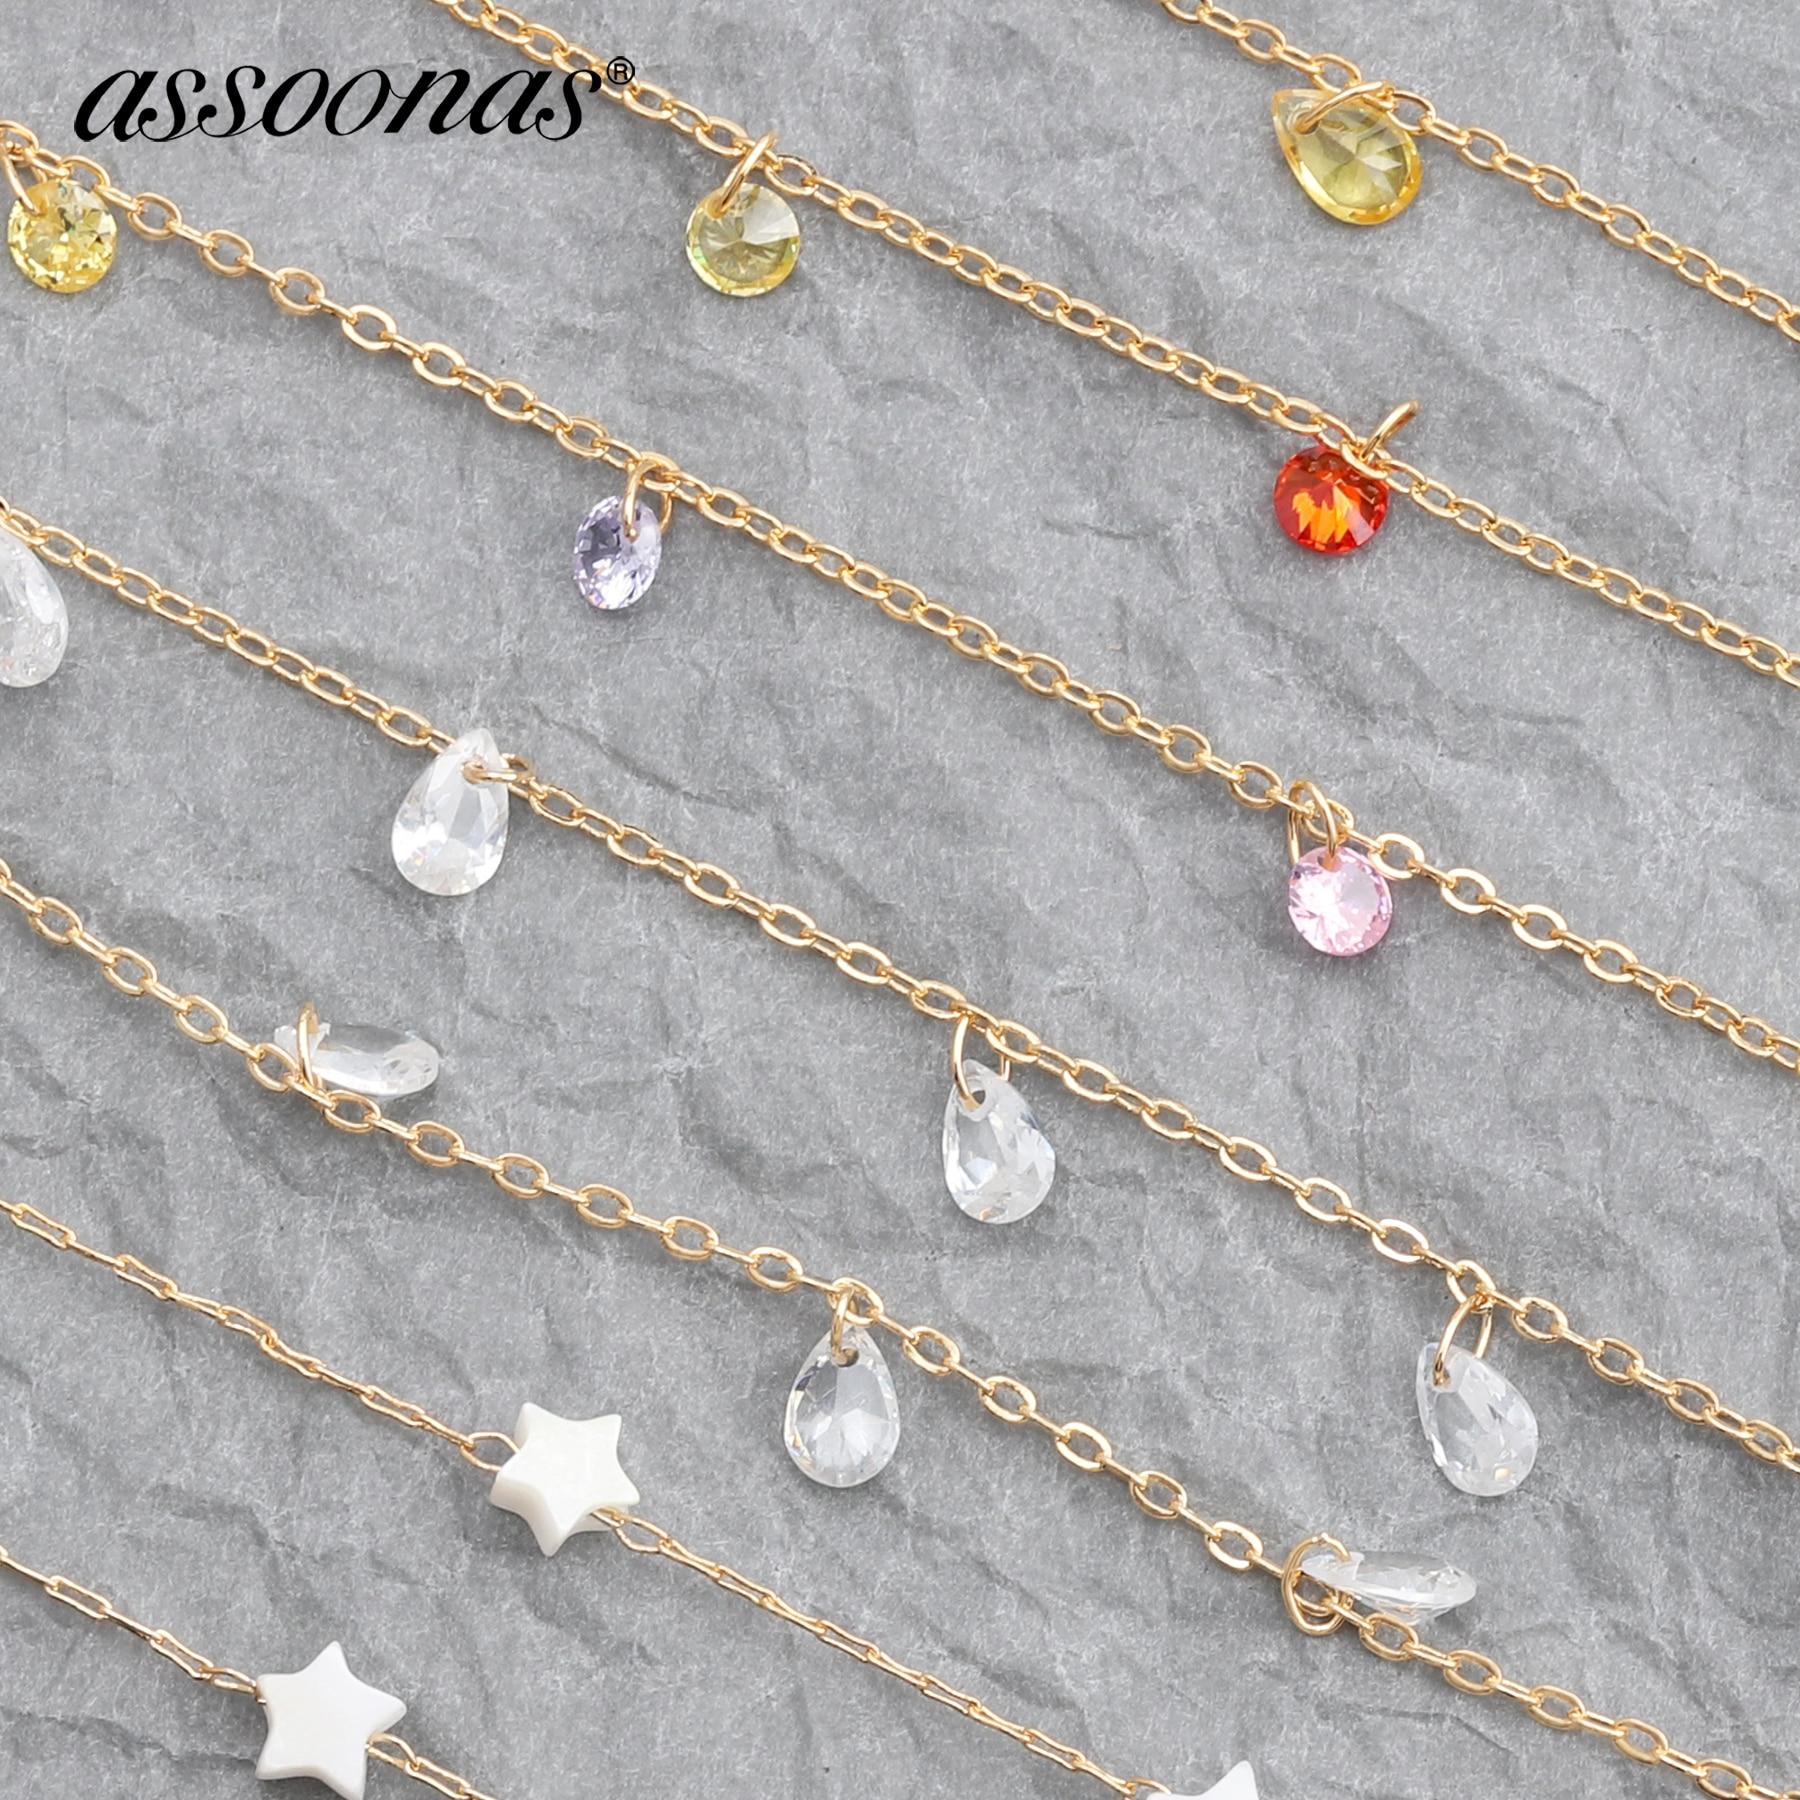 Assoonas C45,chain,jewelry Accessories,jewelry Making,hand Made,charm,jewelry Findings,Golden Gemstone Chain,diy Chain,1m/lot